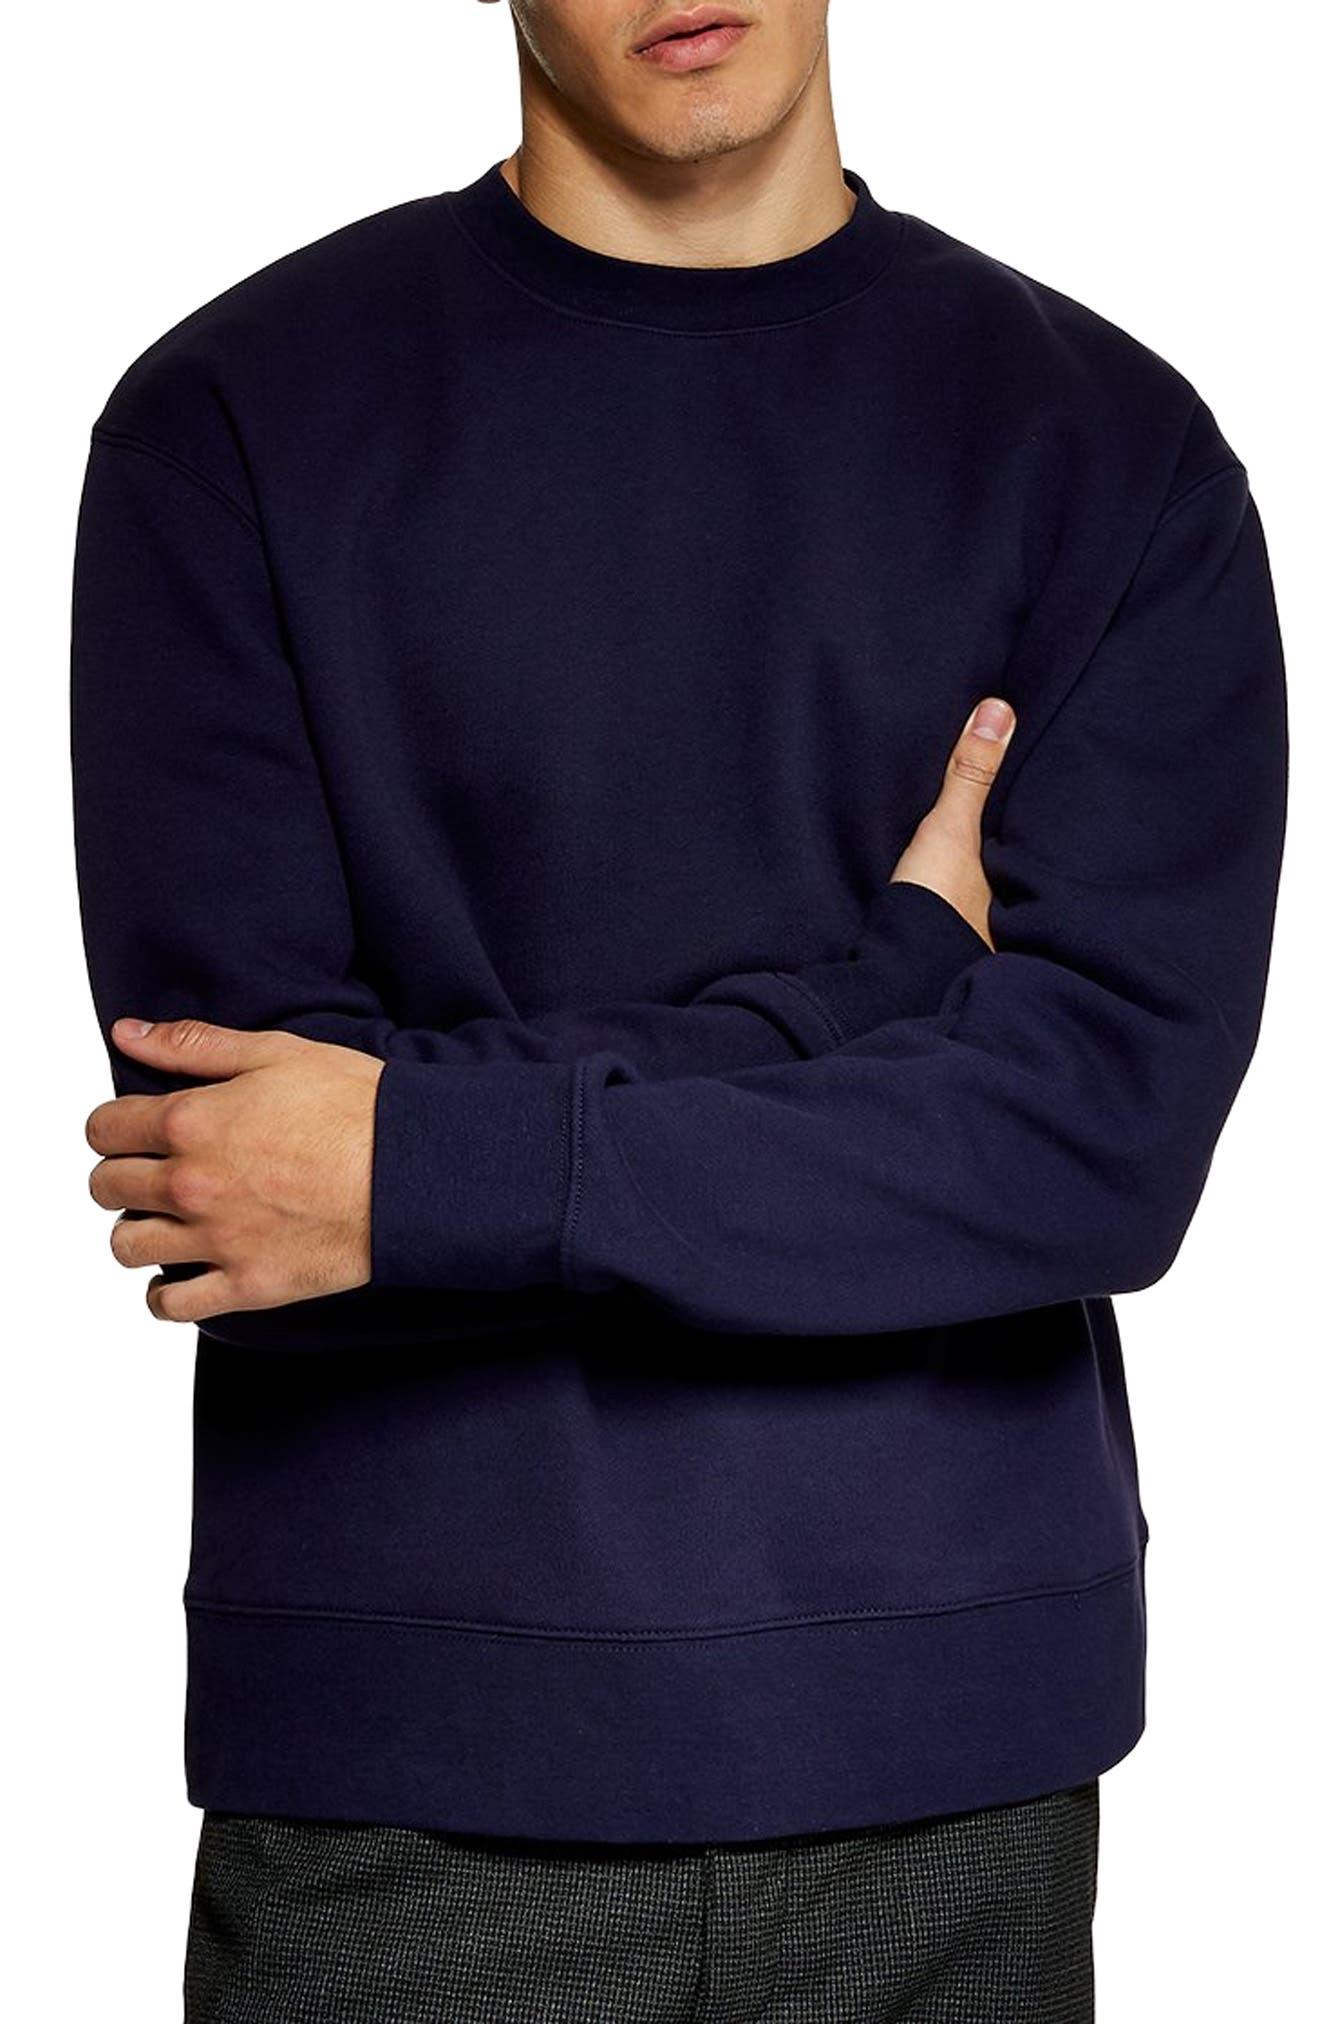 Tristan Sweatshirt,                             Main thumbnail 1, color,                             NAVY BLUE